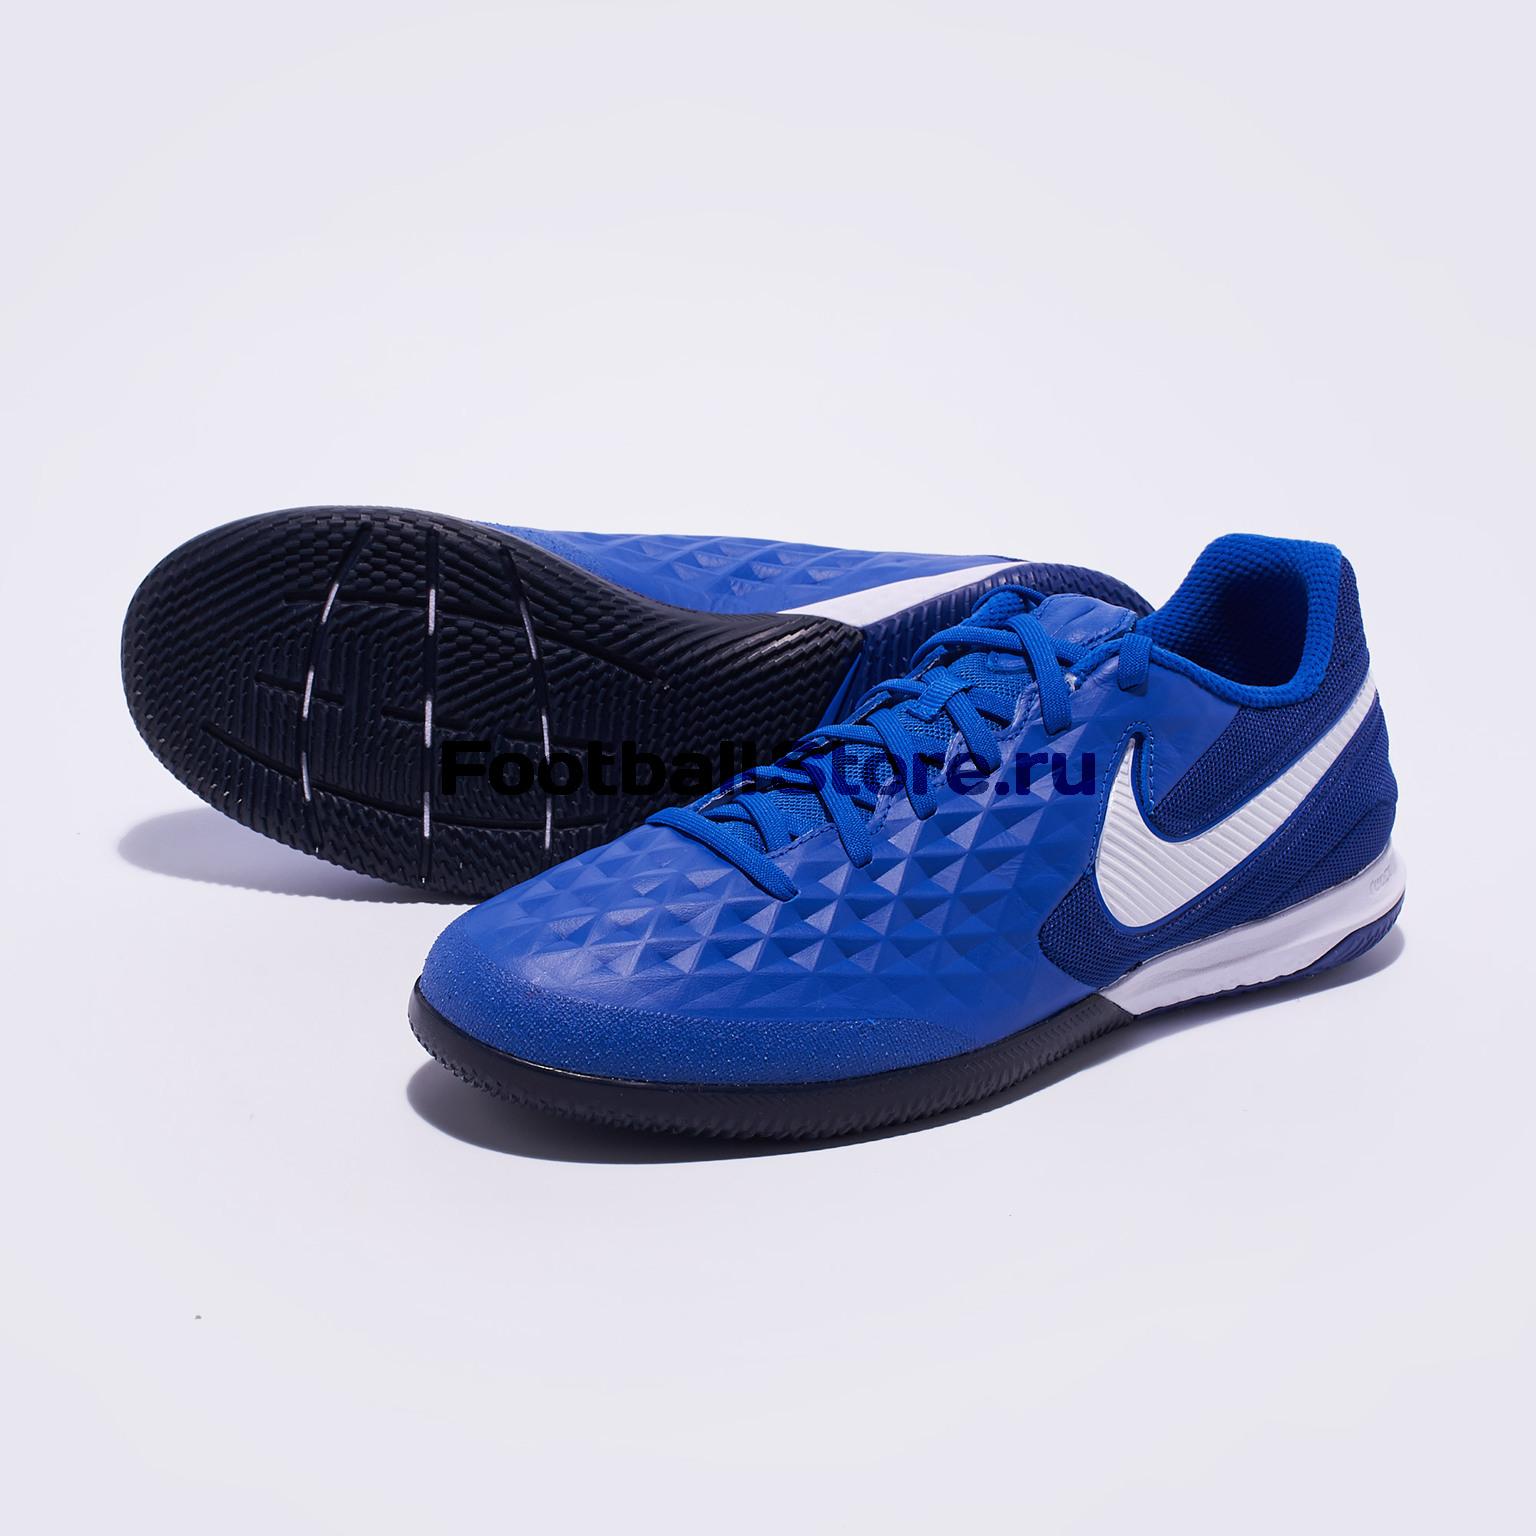 Футзалки Nike React Legend 8 Pro IC AT6134-414